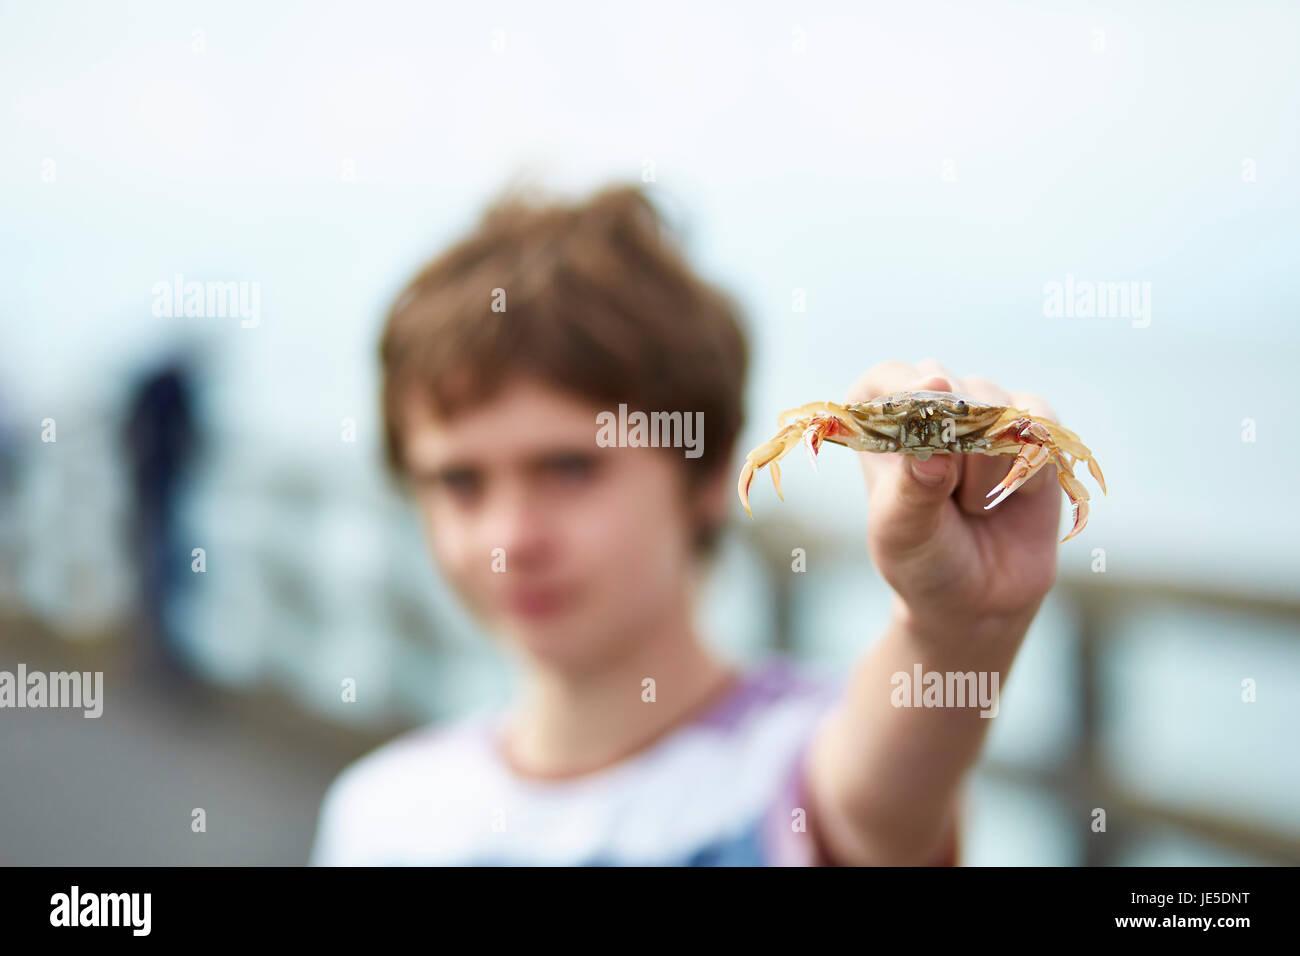 Junge (11) hält sich eine Krabbe Stockbild